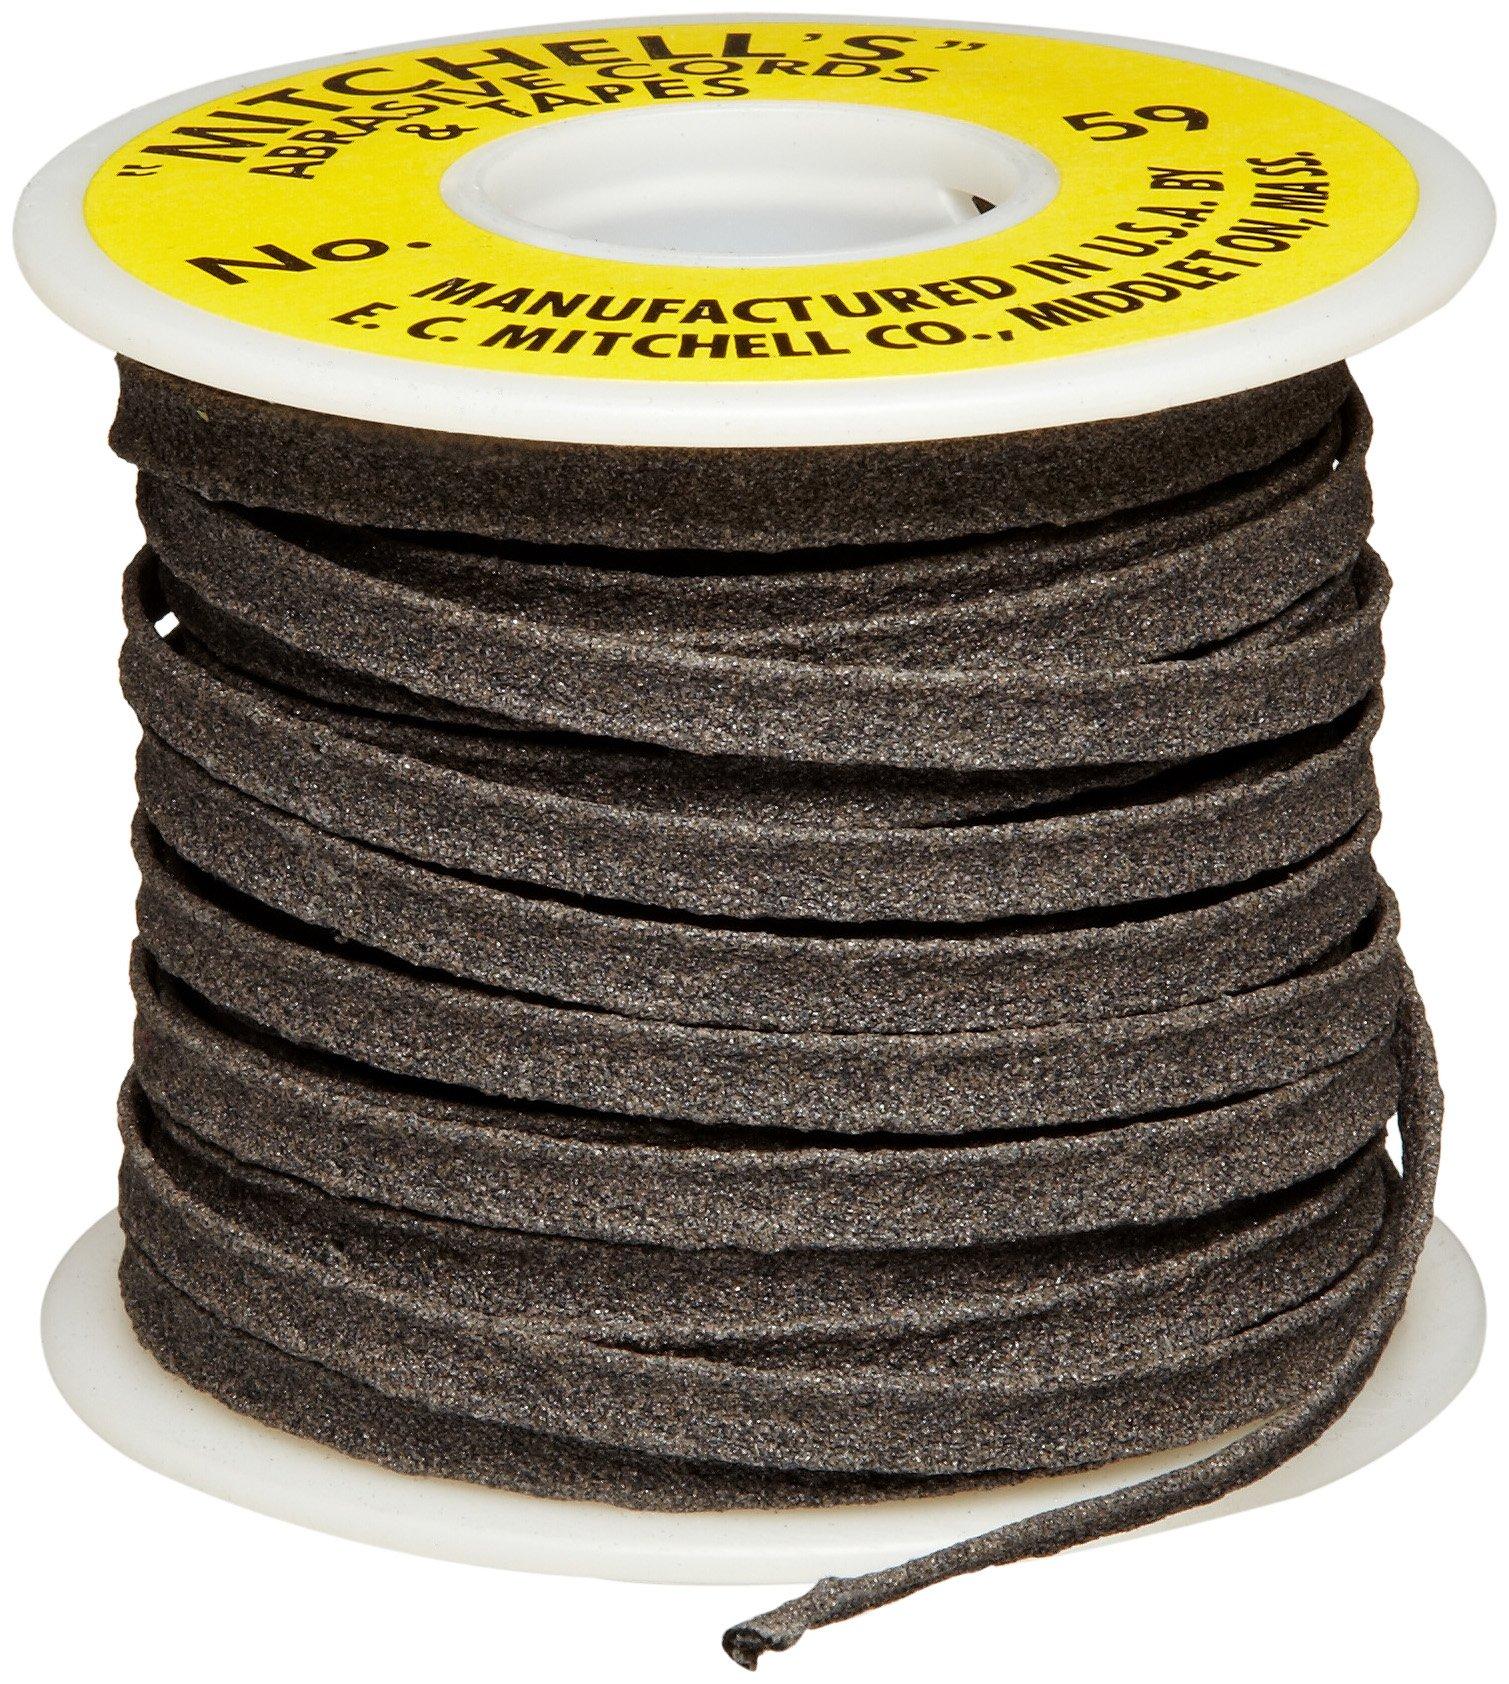 Mitchell Abrasives 59 Flat Abrasive Tape, Aluminum Oxide 150 Grit 1/4'' Wide x 50 Feet